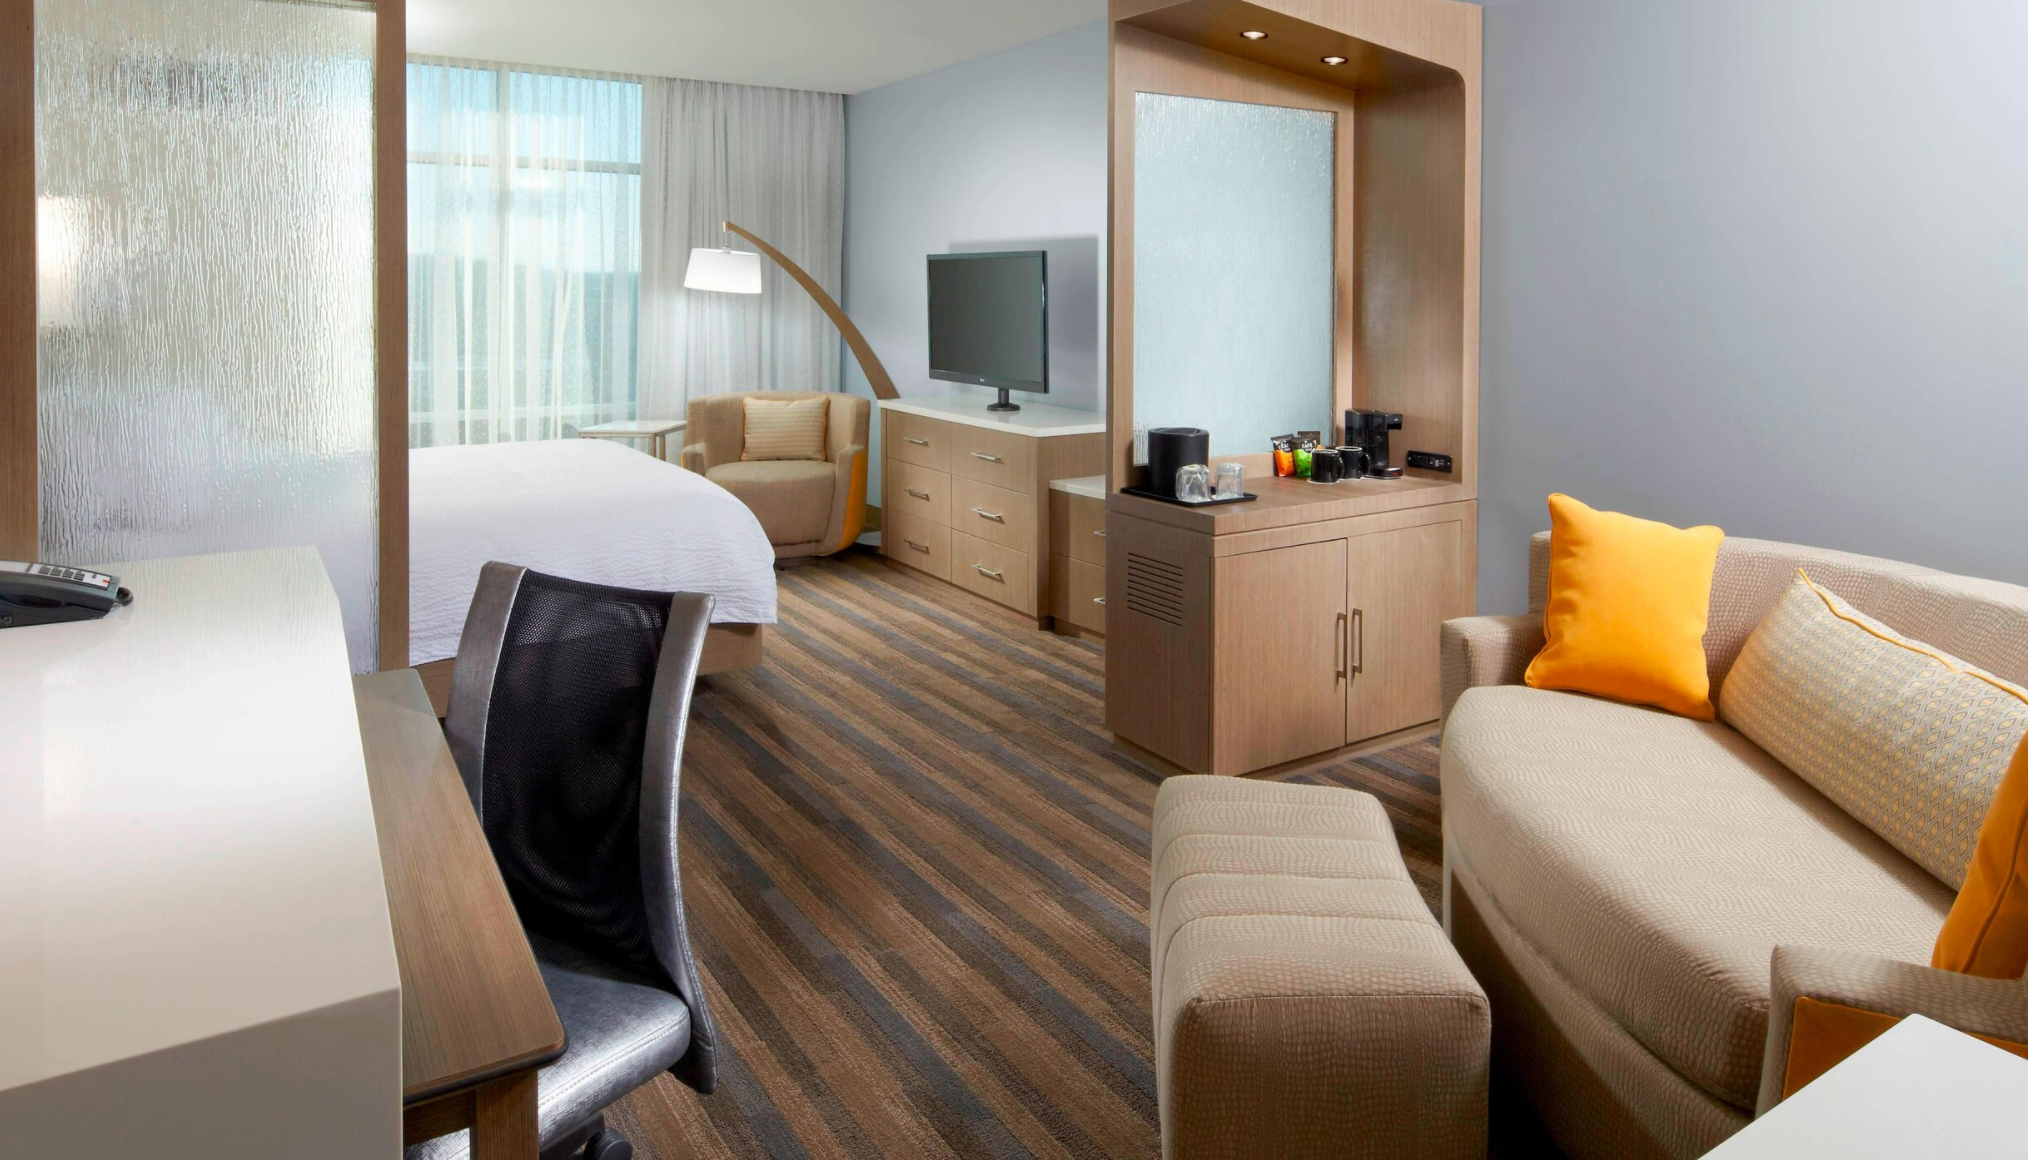 https://www.hotelsbyday.com/_data/default-hotel_image/3/18694/screenshot-2020-06-13-at-7-33-38-pm.png